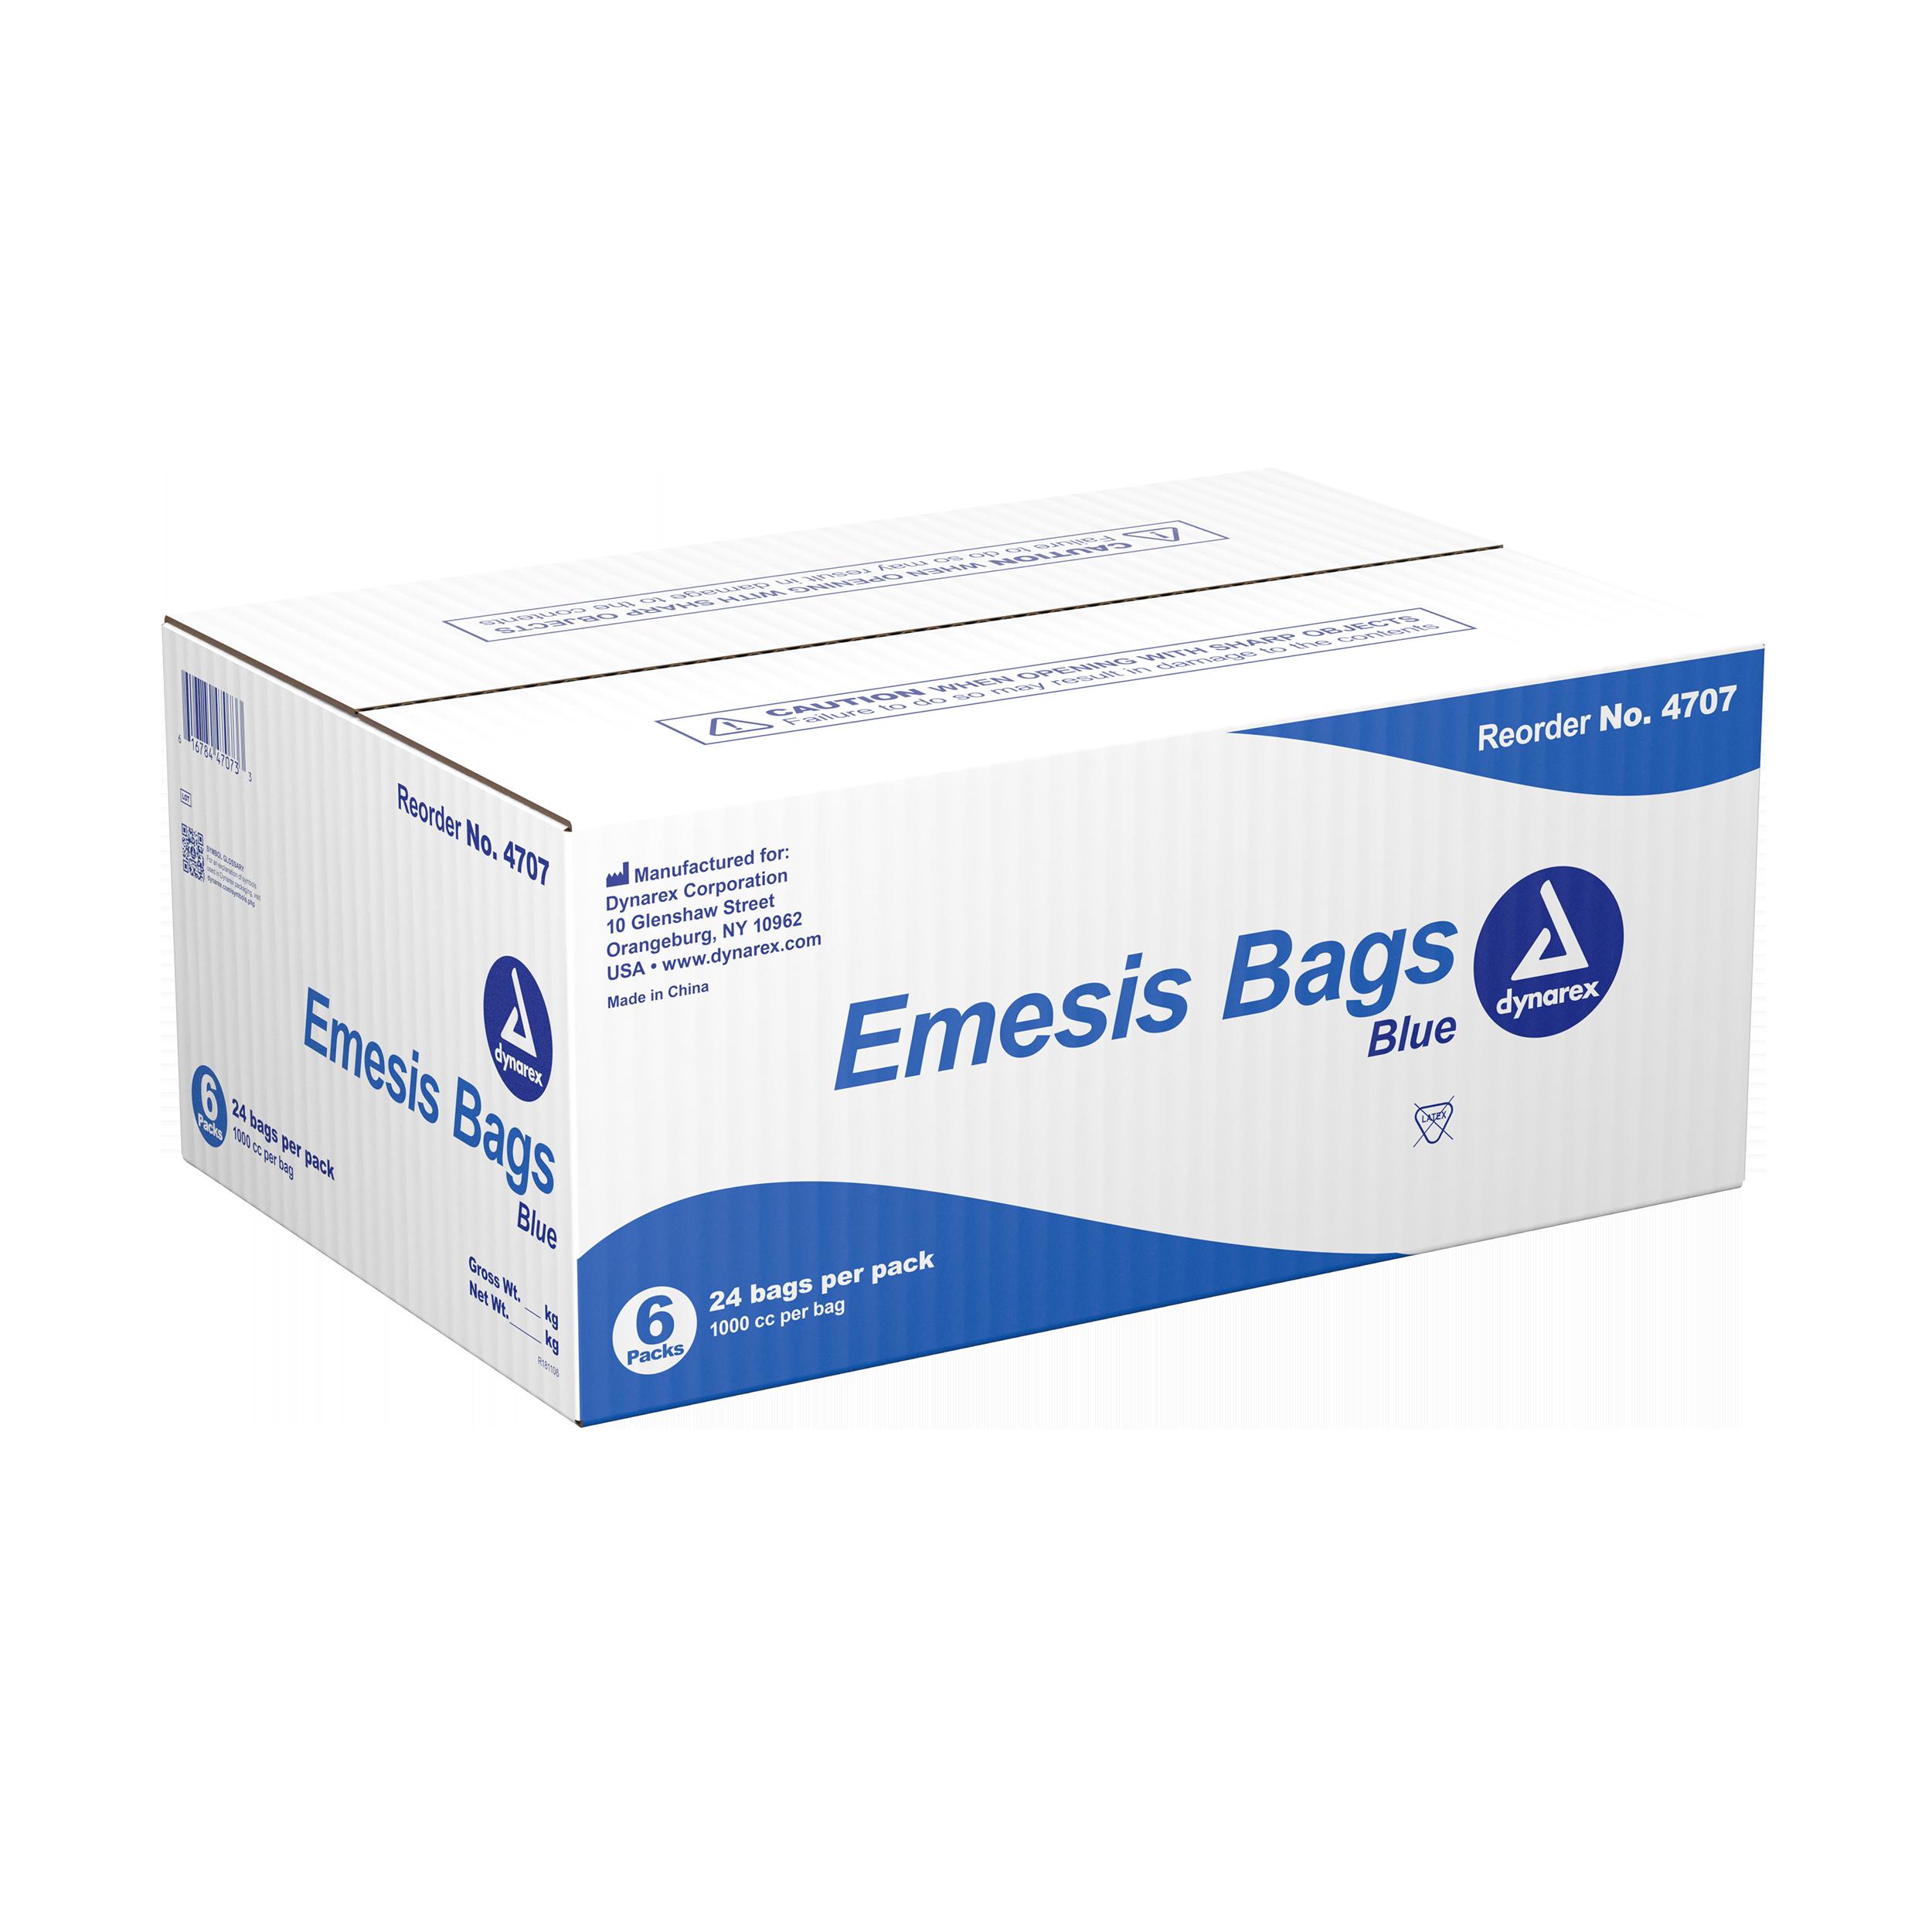 Emesis Bag - Blue - 6/24/Cs